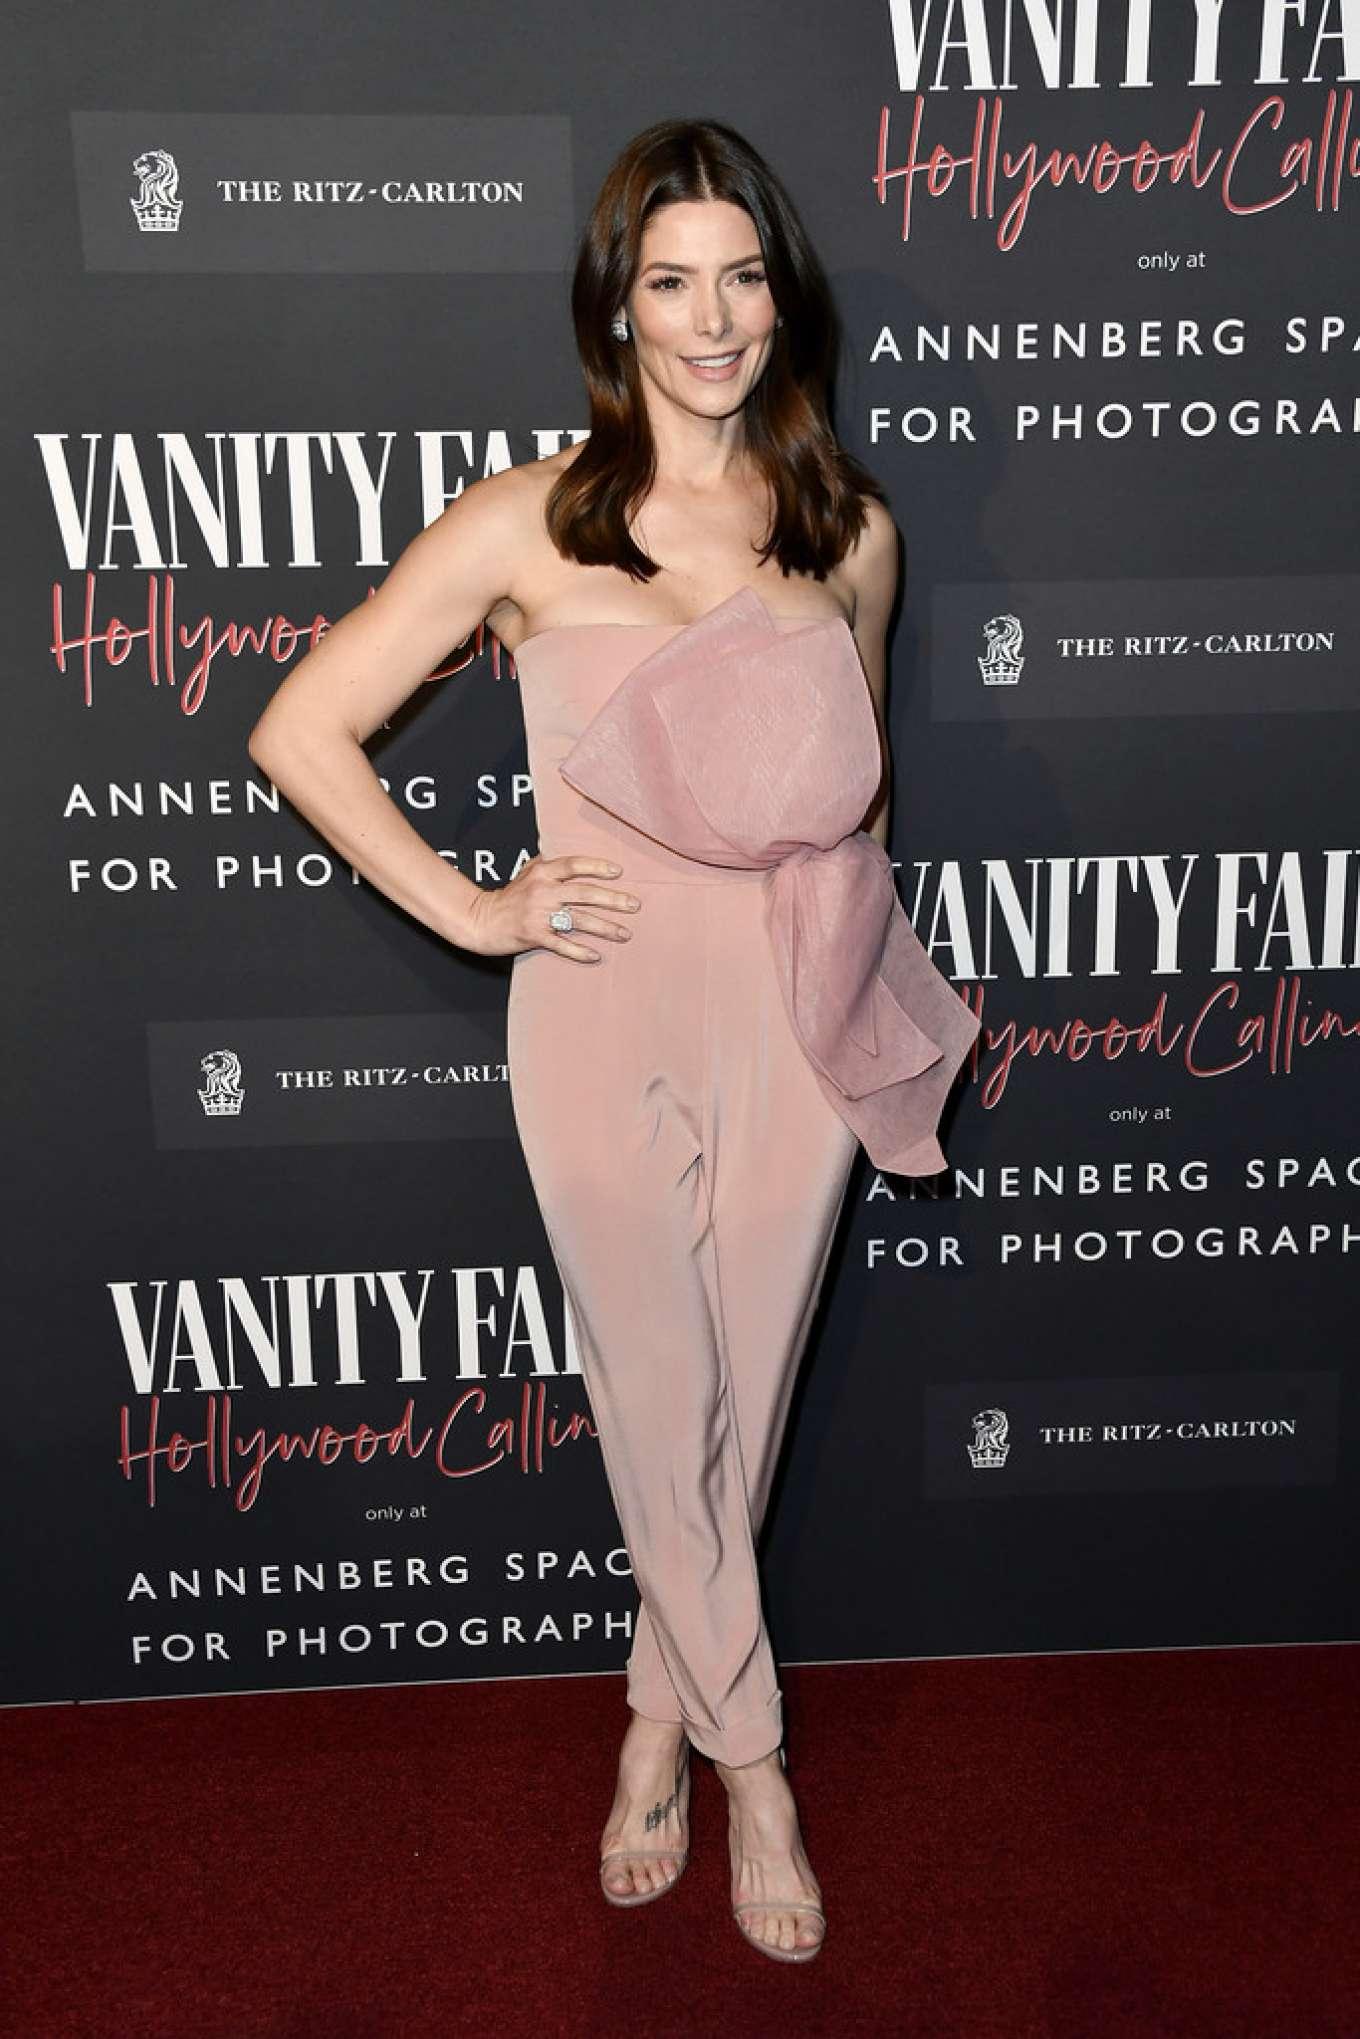 Ashley Greene 2020 : Ashley Greene – Vanity Fair: Hollywood Calling Opening in Century City-04